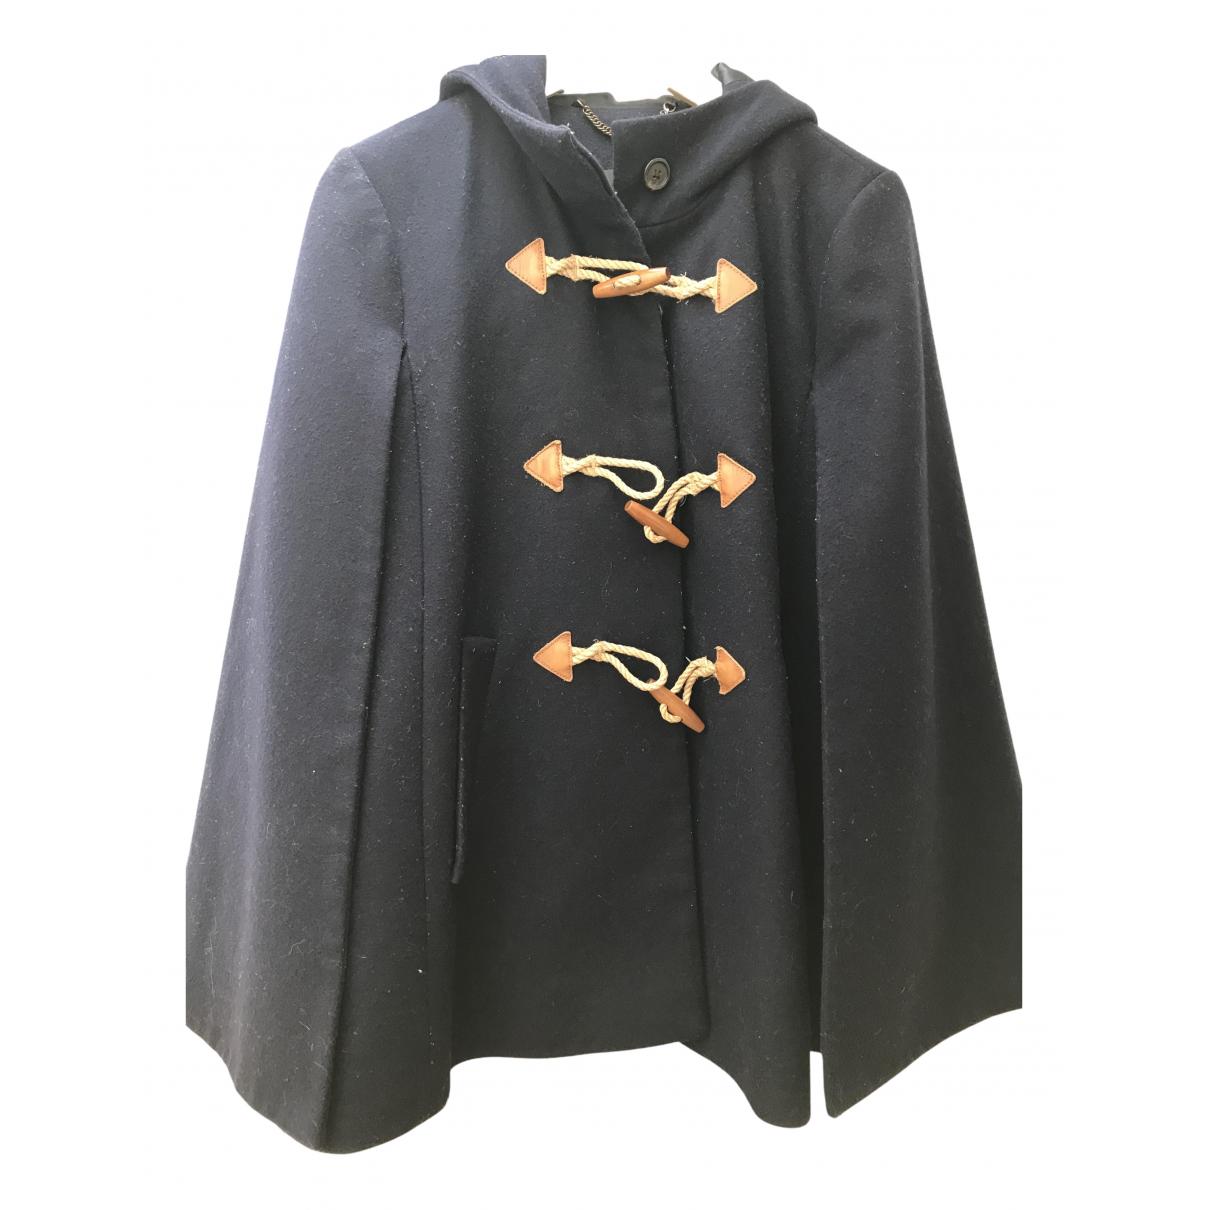 J.crew \N Navy Wool jacket for Women XS International